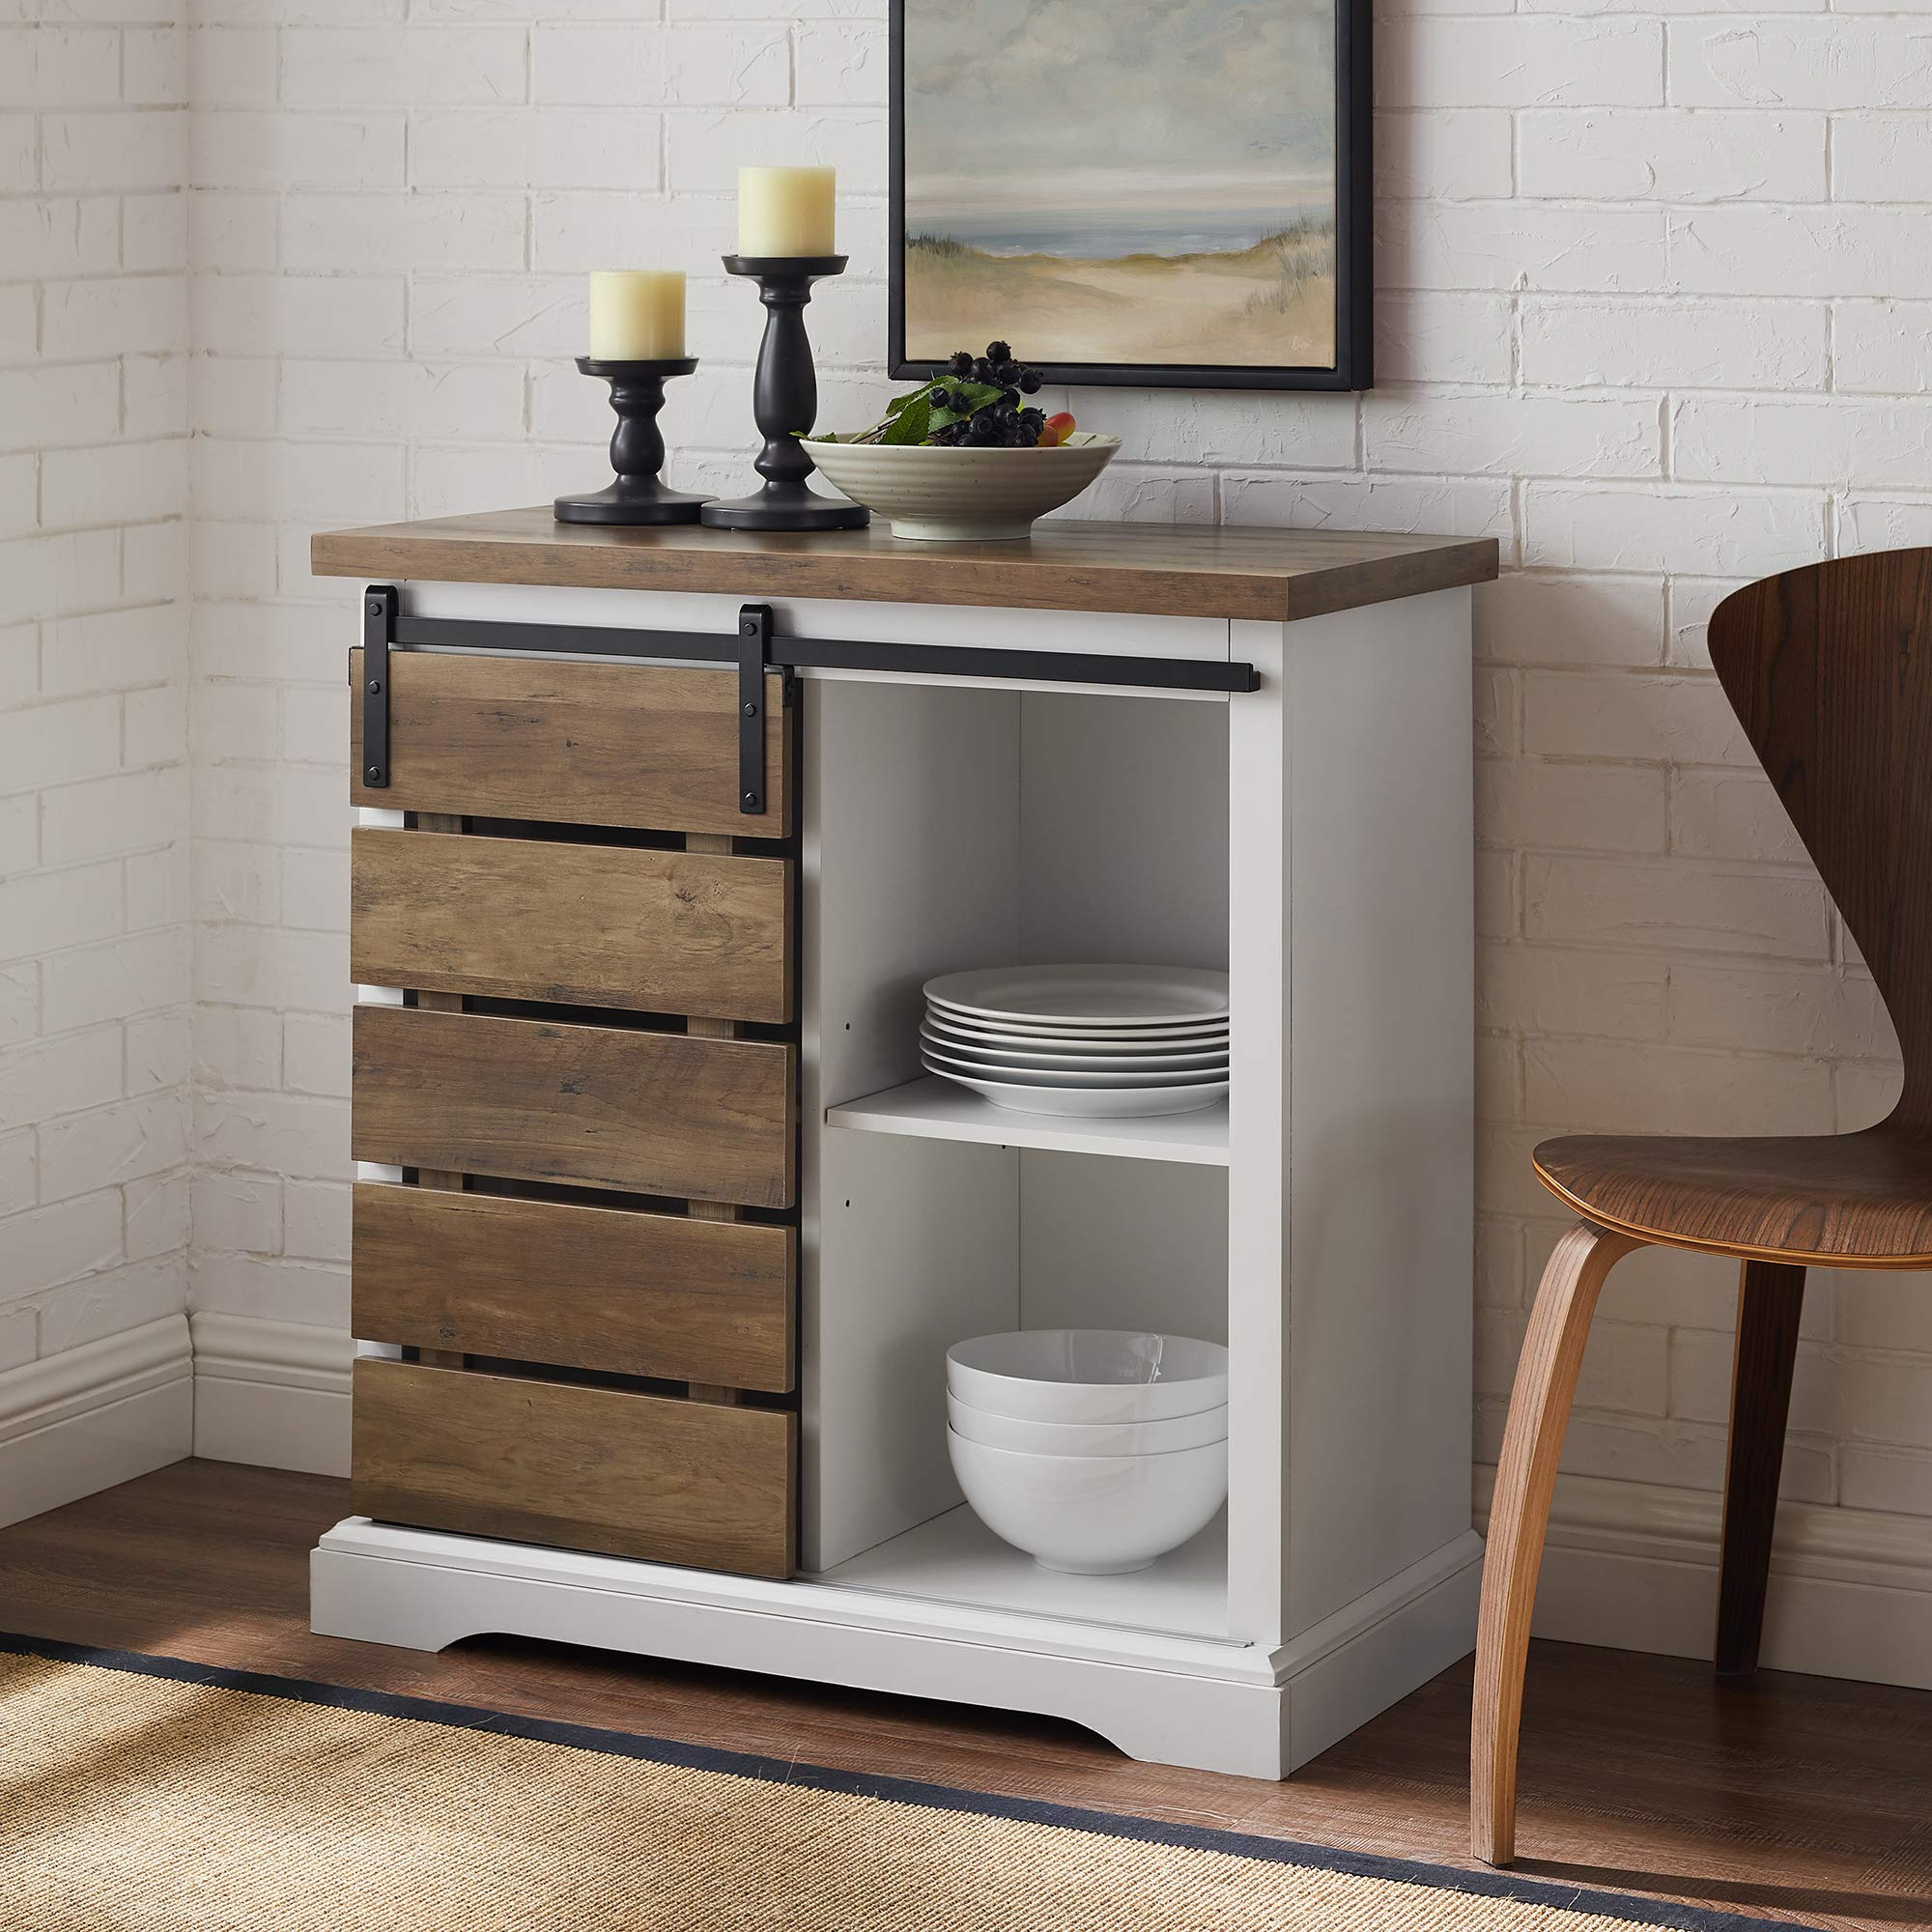 WE Furniture AZF32ALSDRO Buffet, 32'', Solid White/Rustic Oak by WE Furniture (Image #1)